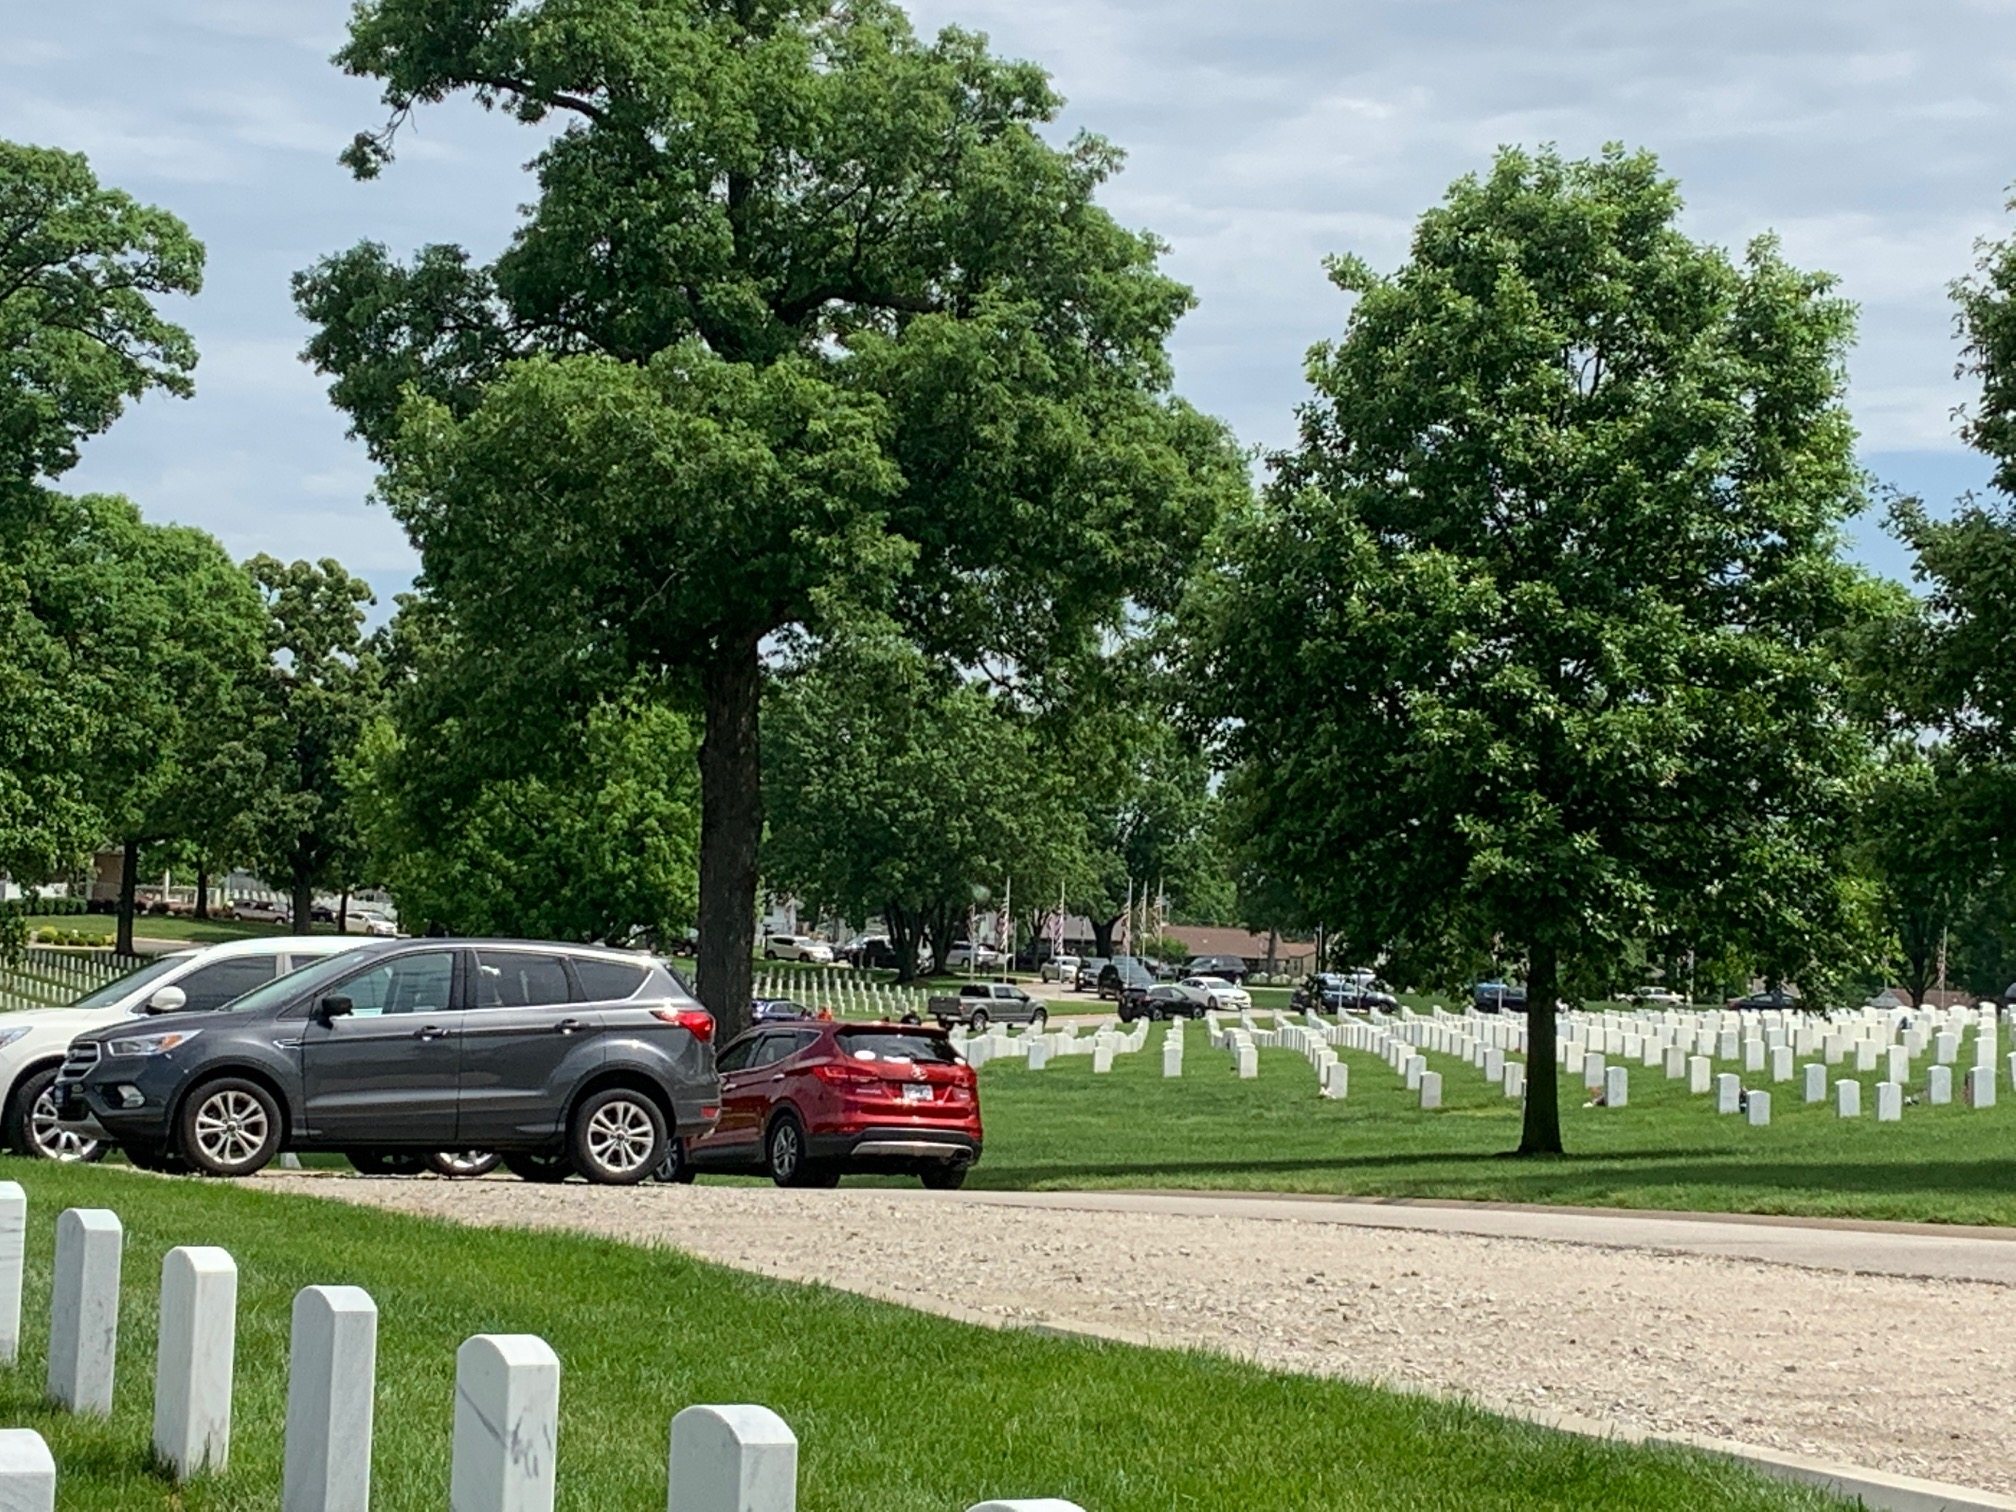 Jefferson Barracks National Cemetery. Virginia Kruta/Daily Caller